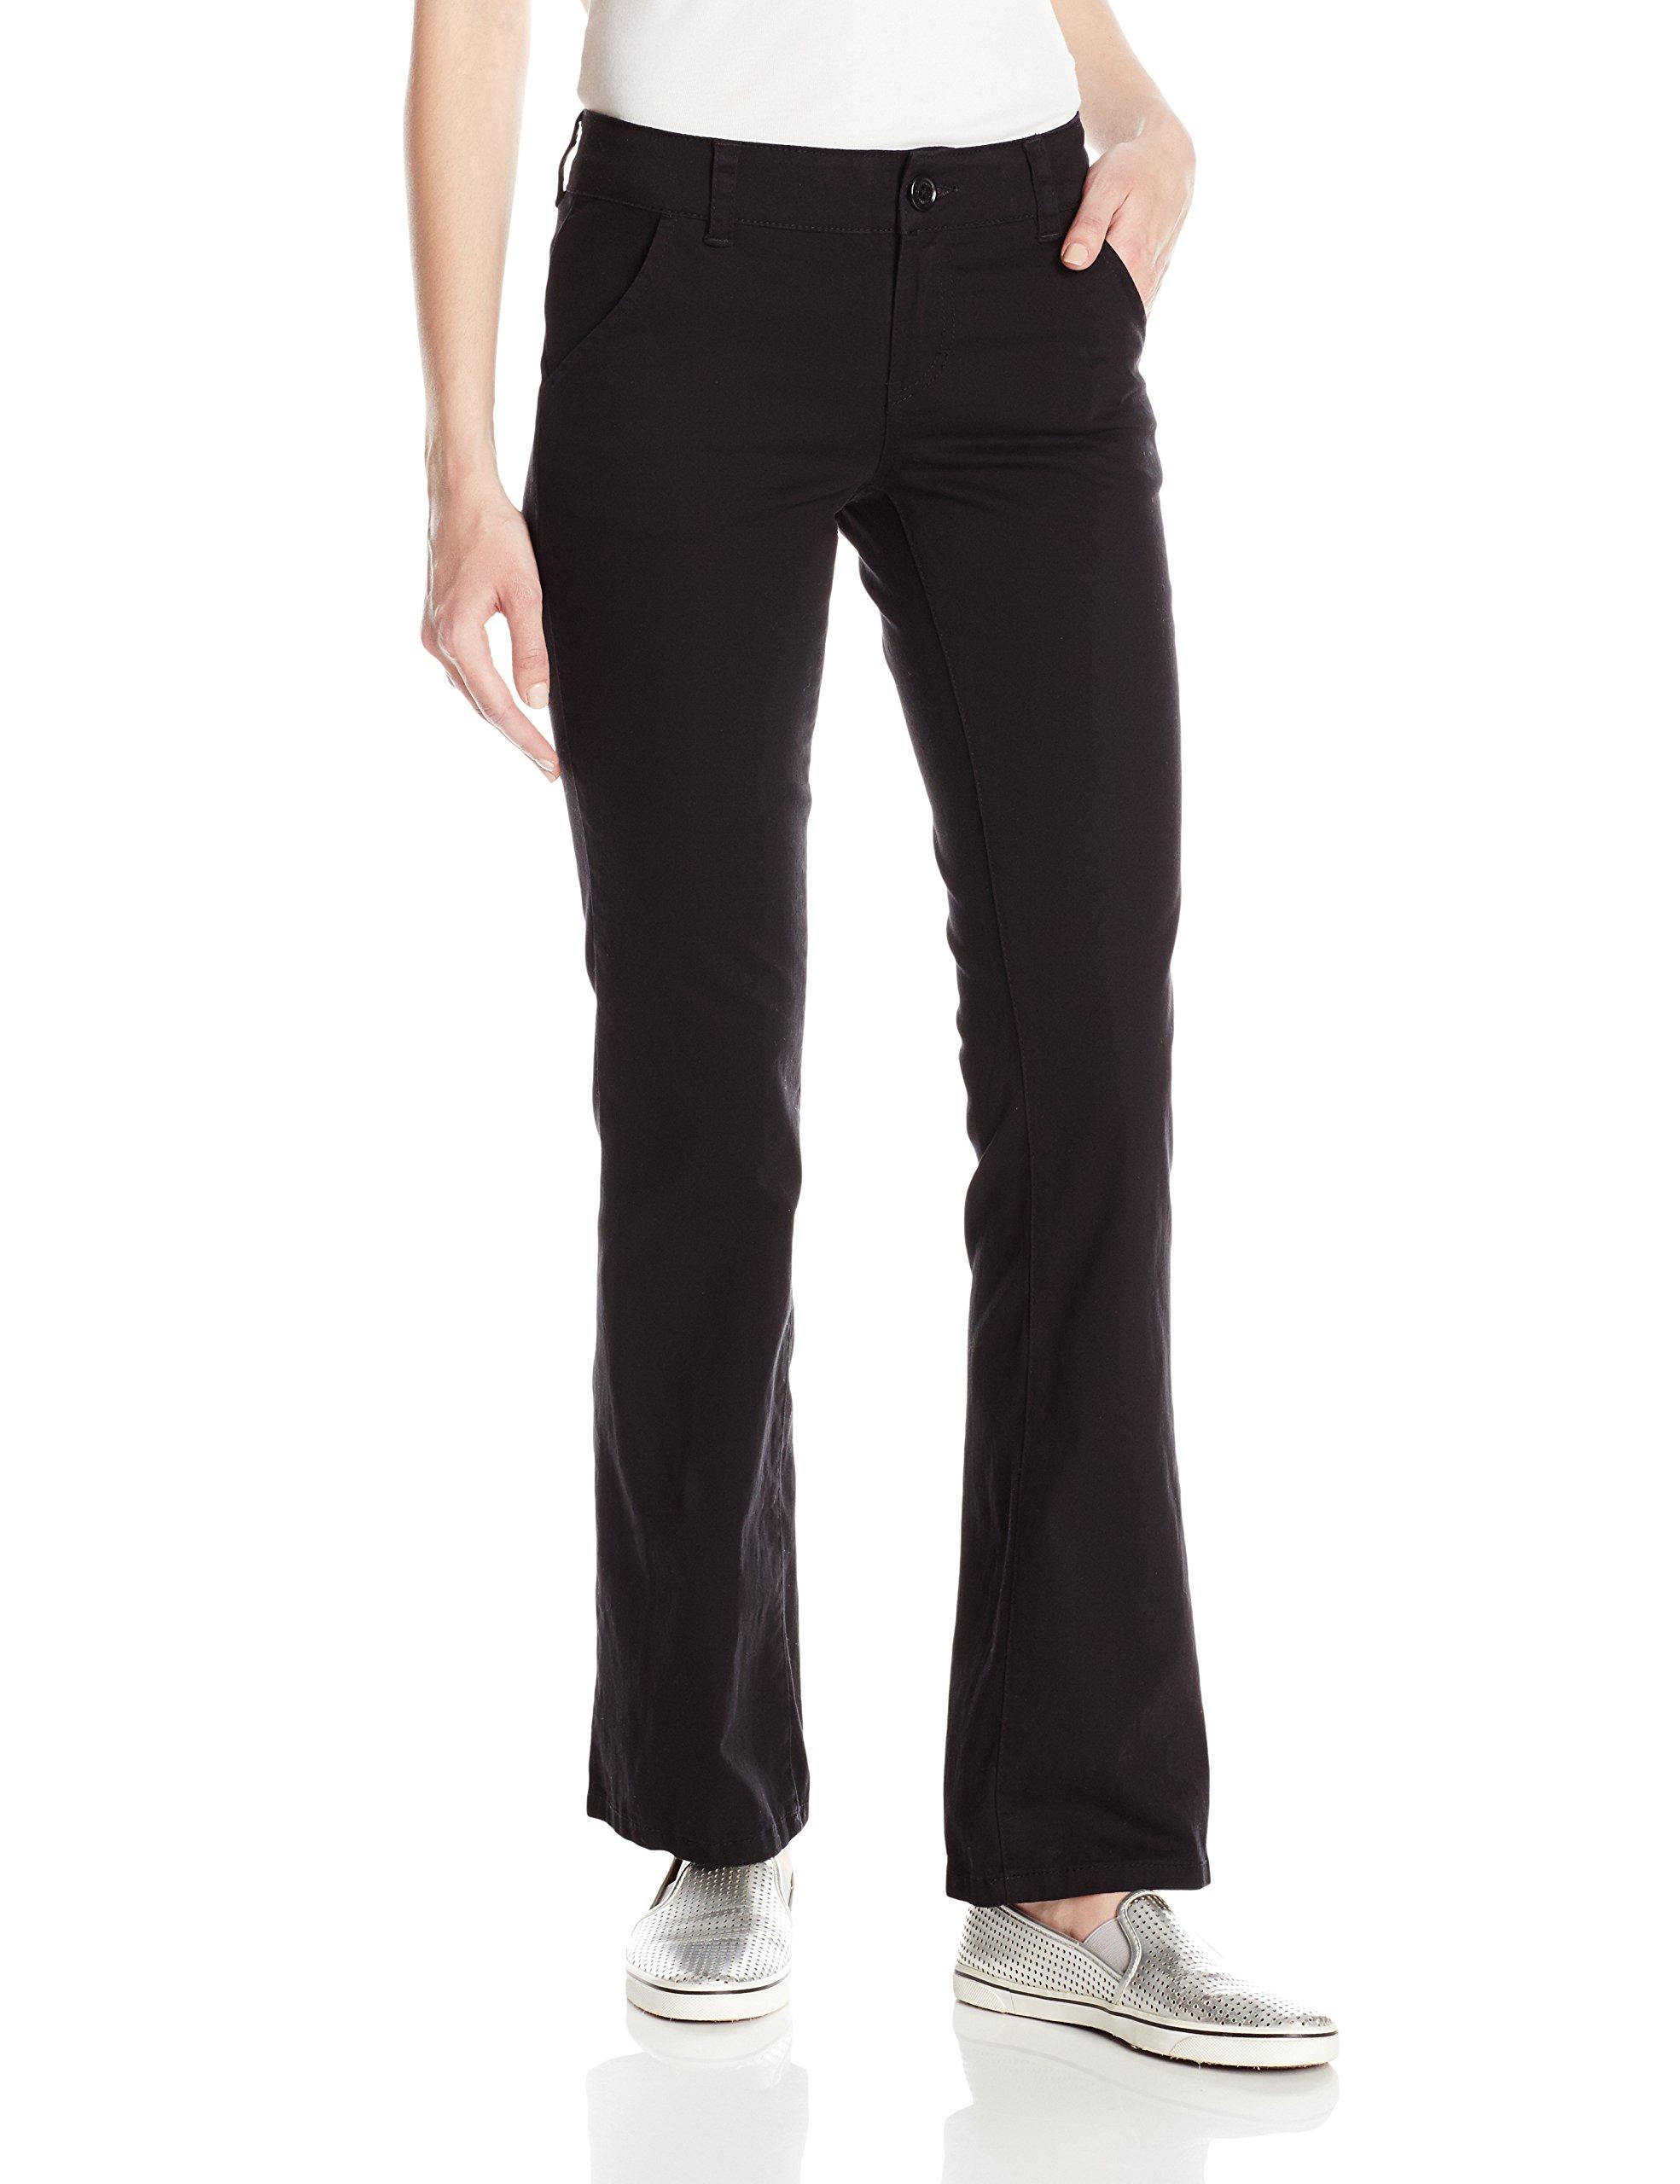 UNIONBAY Juniors Heather Slash Pocket Uniform Bootcut Pant, New Black, 11